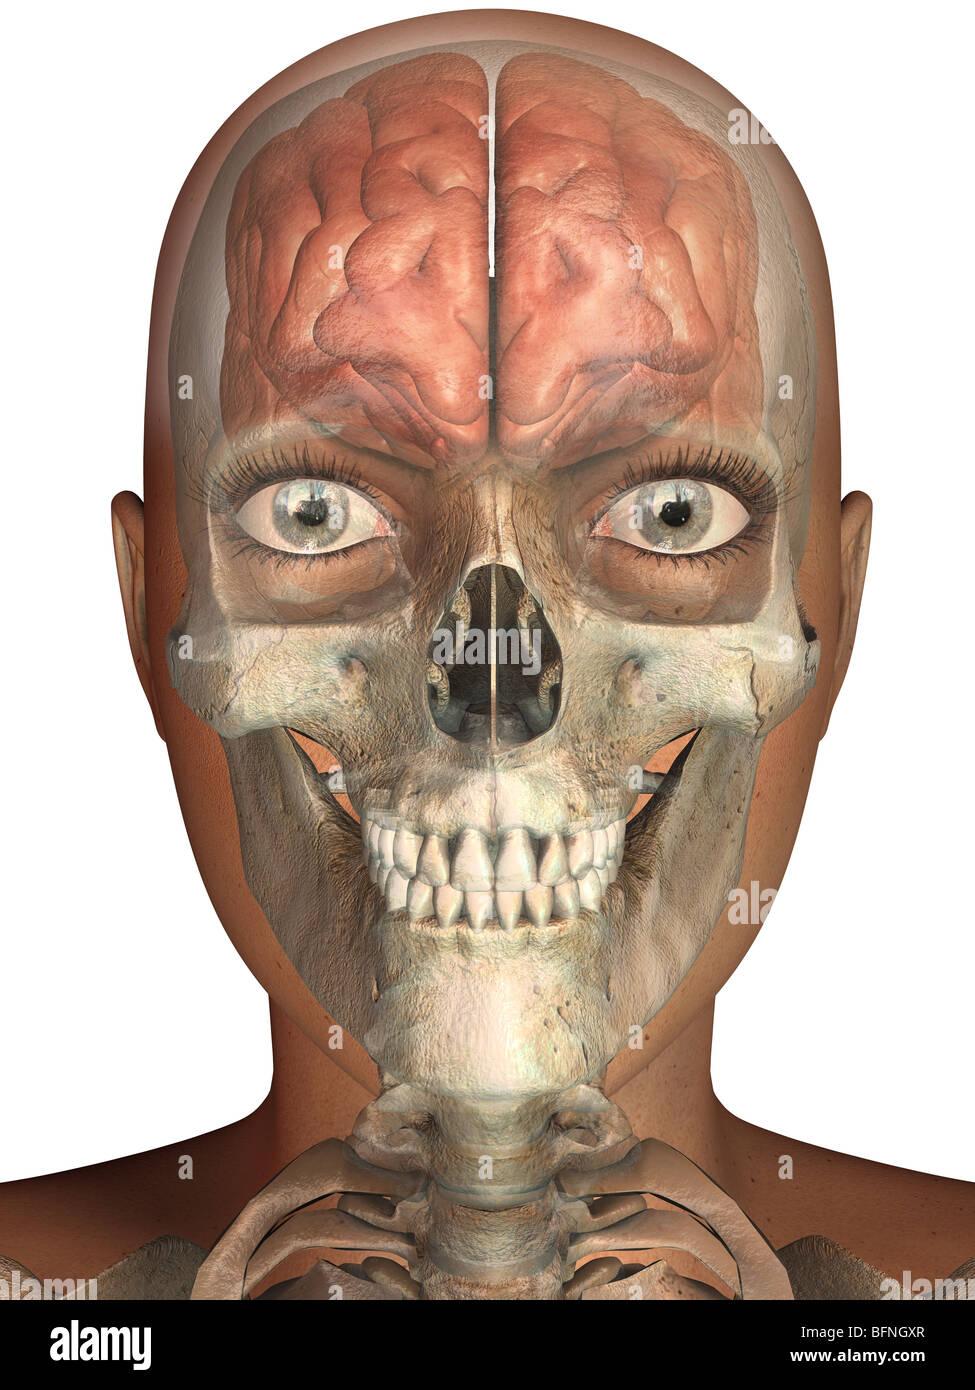 Frontal View Of Skull Stockfotos & Frontal View Of Skull Bilder ...